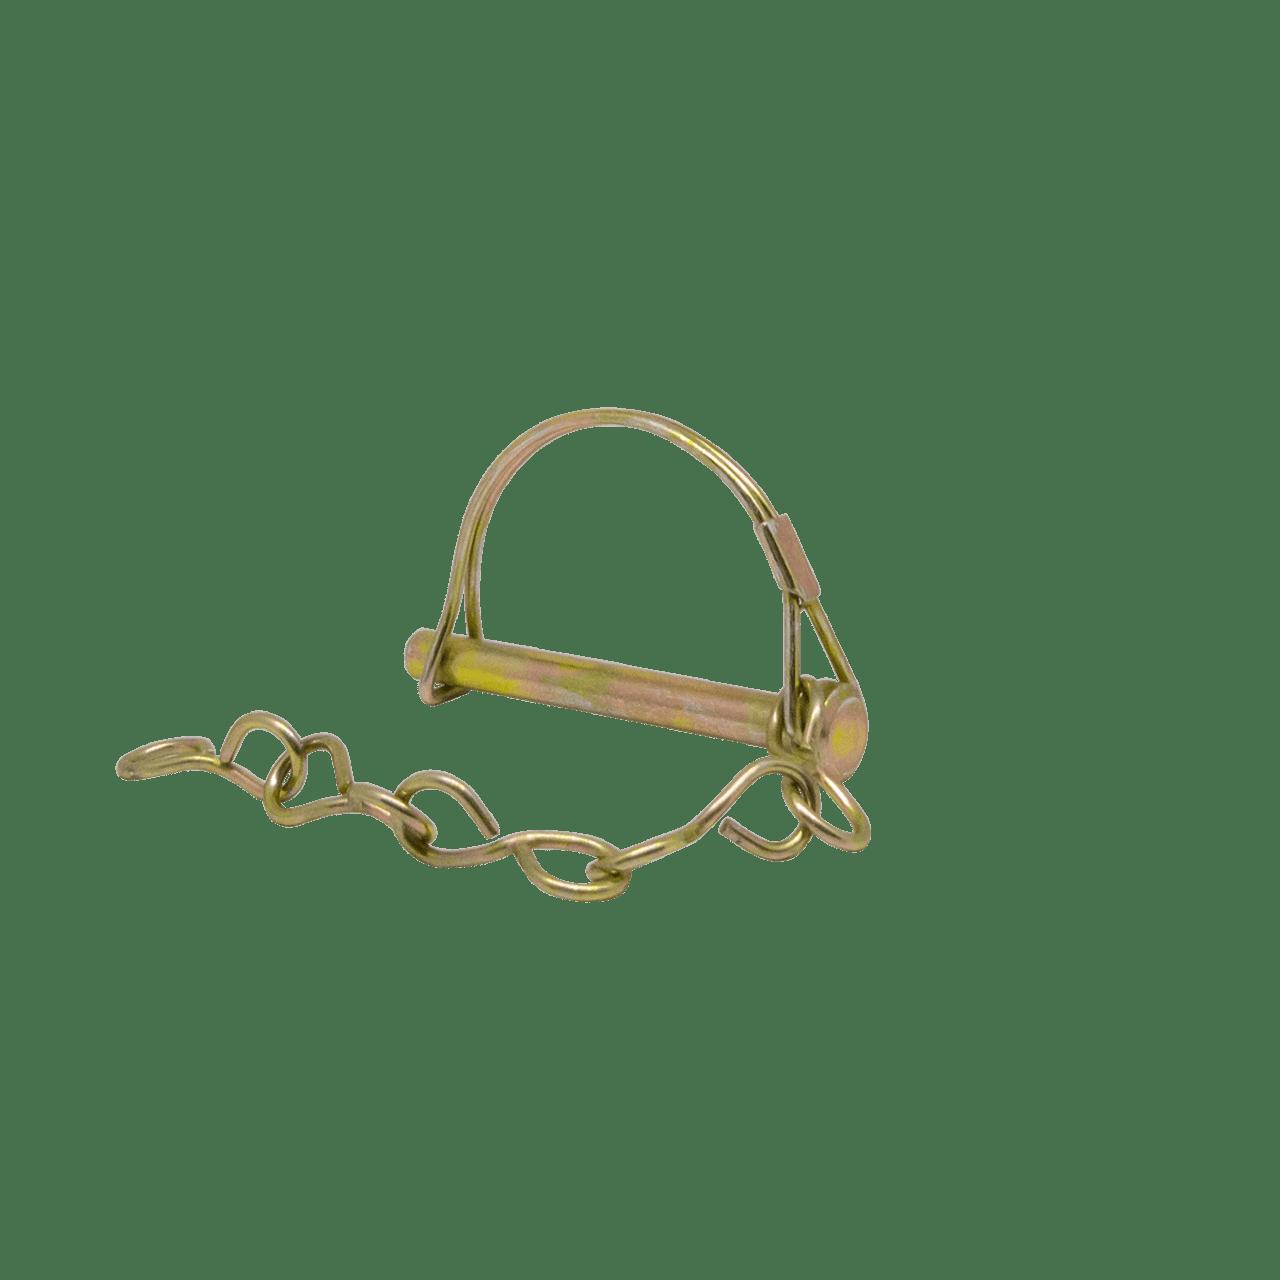 25201 --- BULLDOG Replacement Pin & Chain